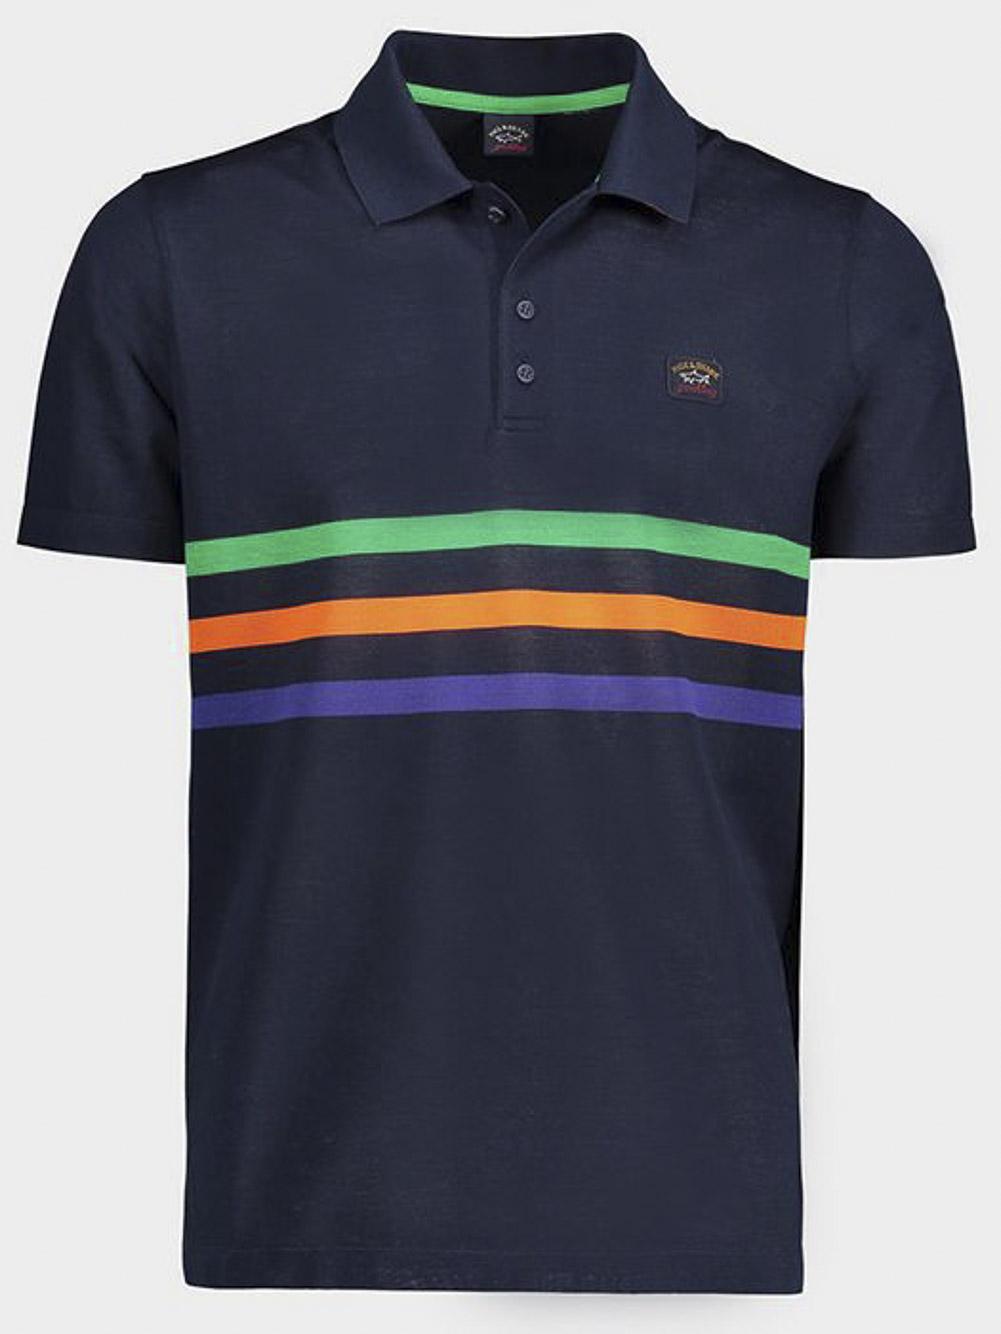 PAUL & SHARK Μπλούζα Polo E20P1274-305 ΜΠΛΕ-ΚΟΚΚΙΝΟ